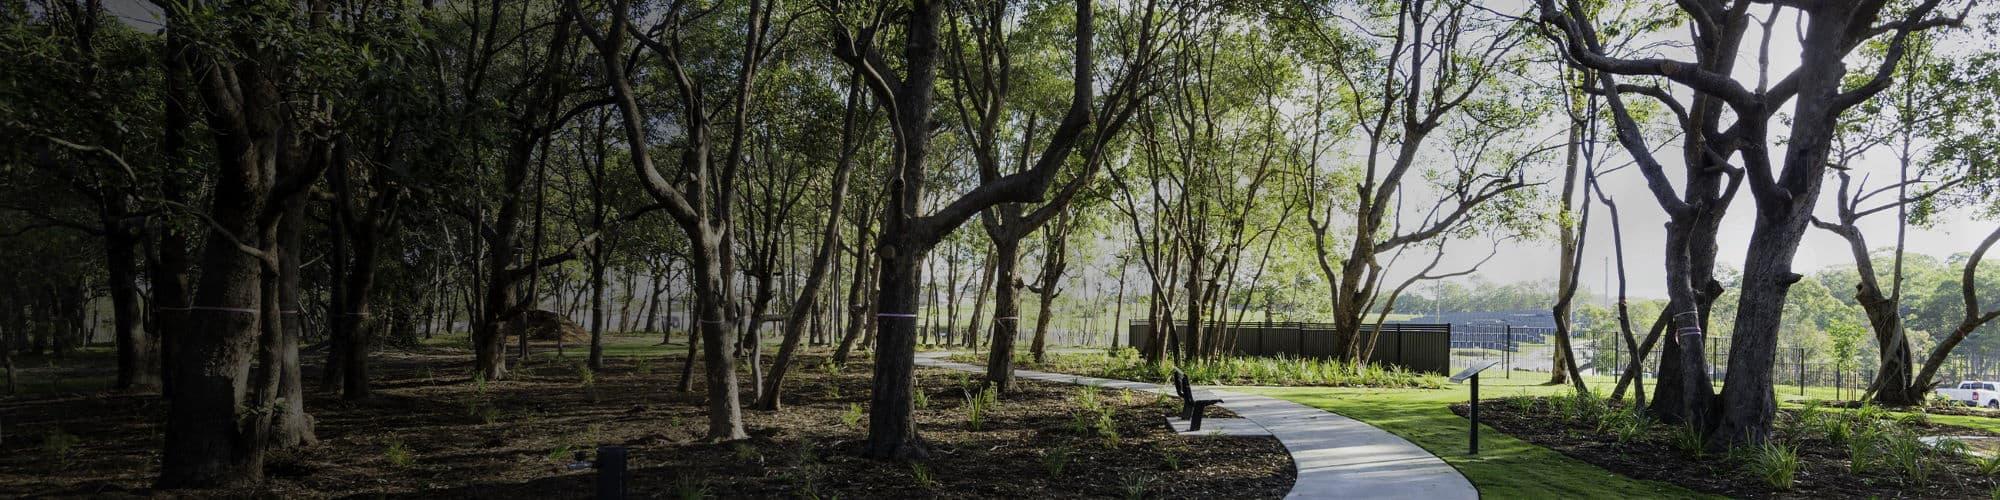 Treescience